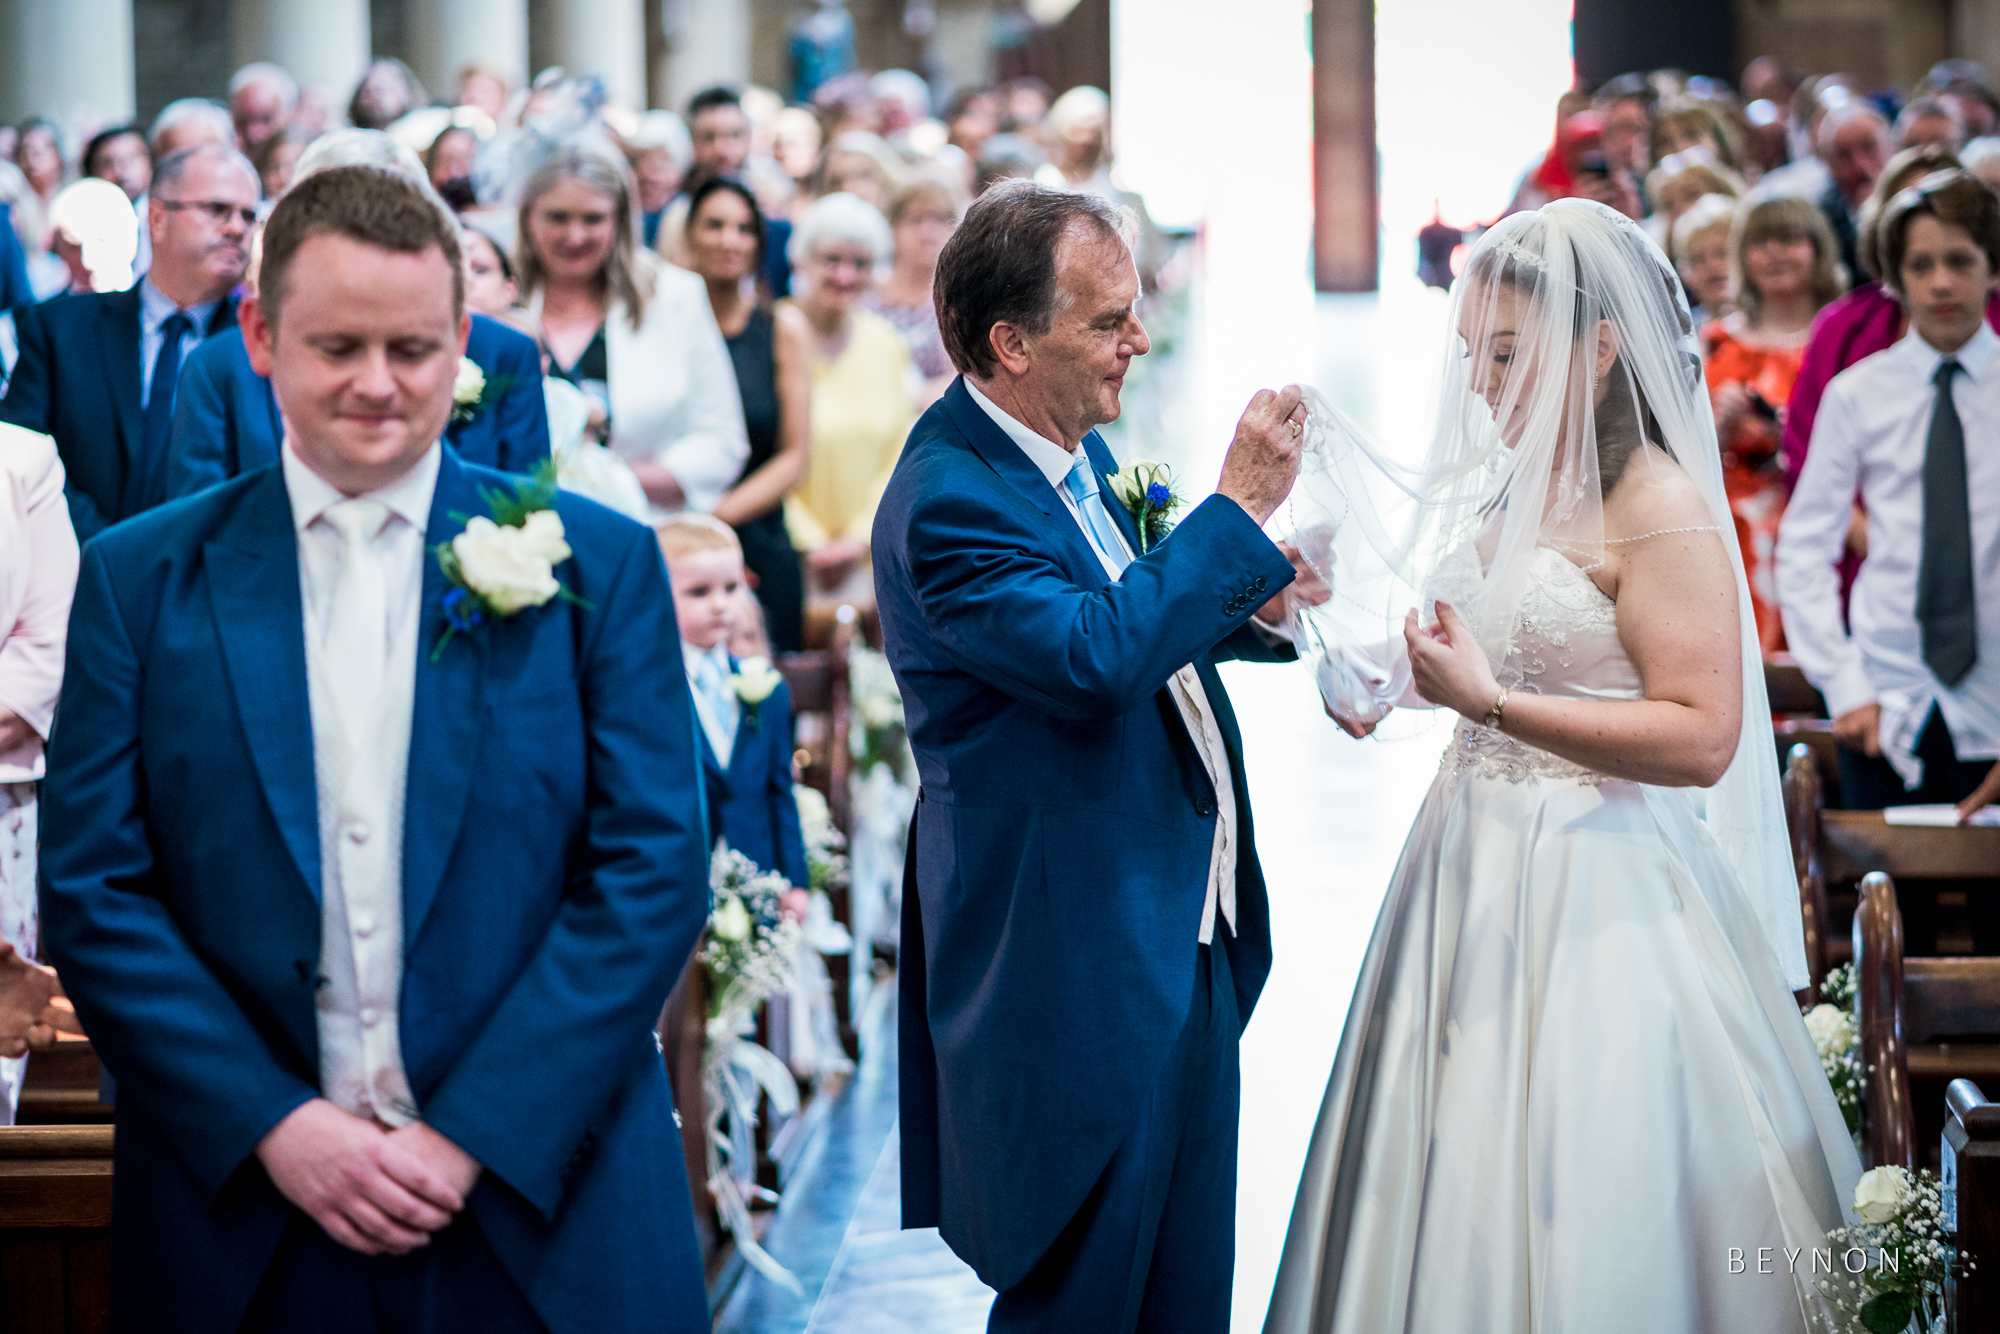 Dad lifts bride's veil